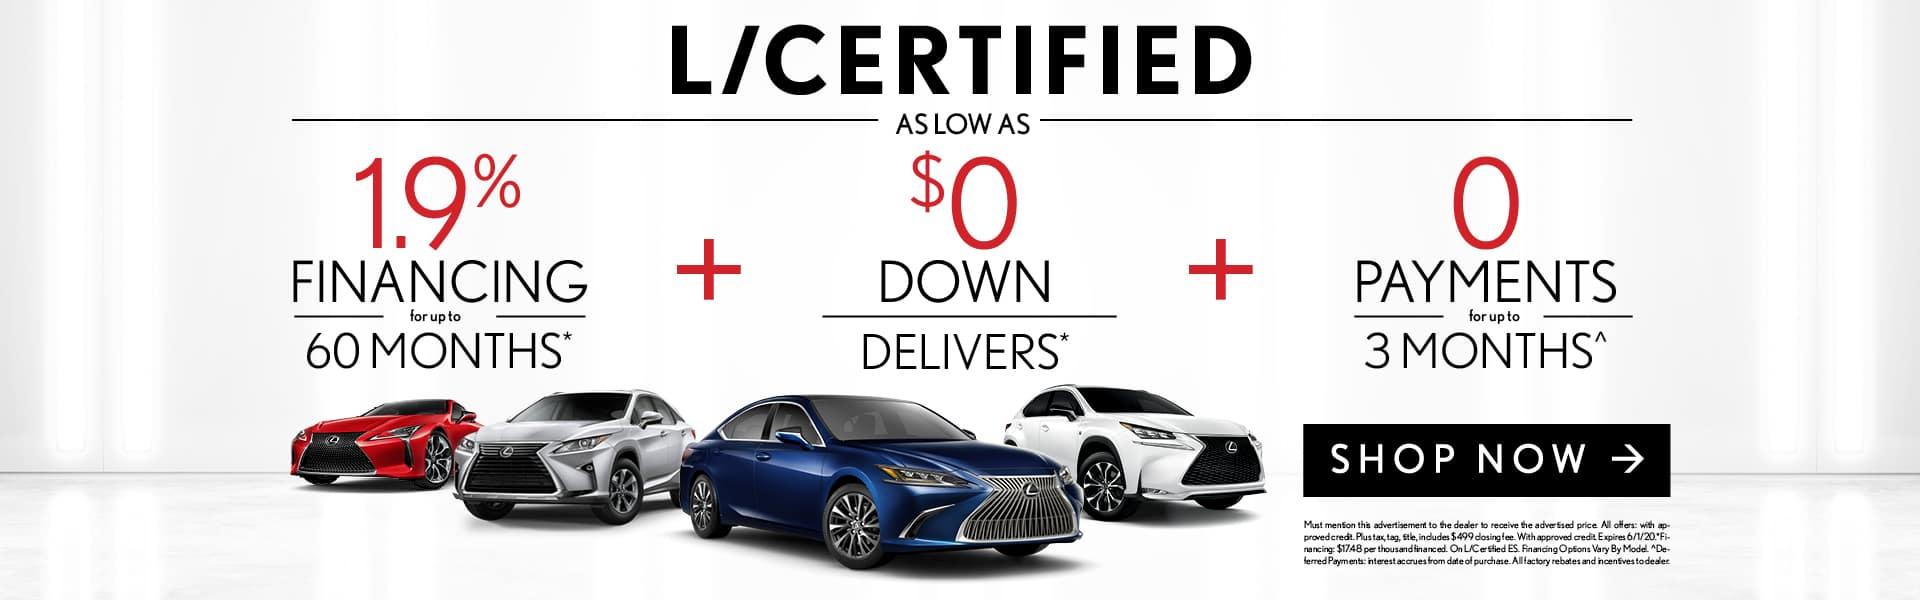 L/Certified